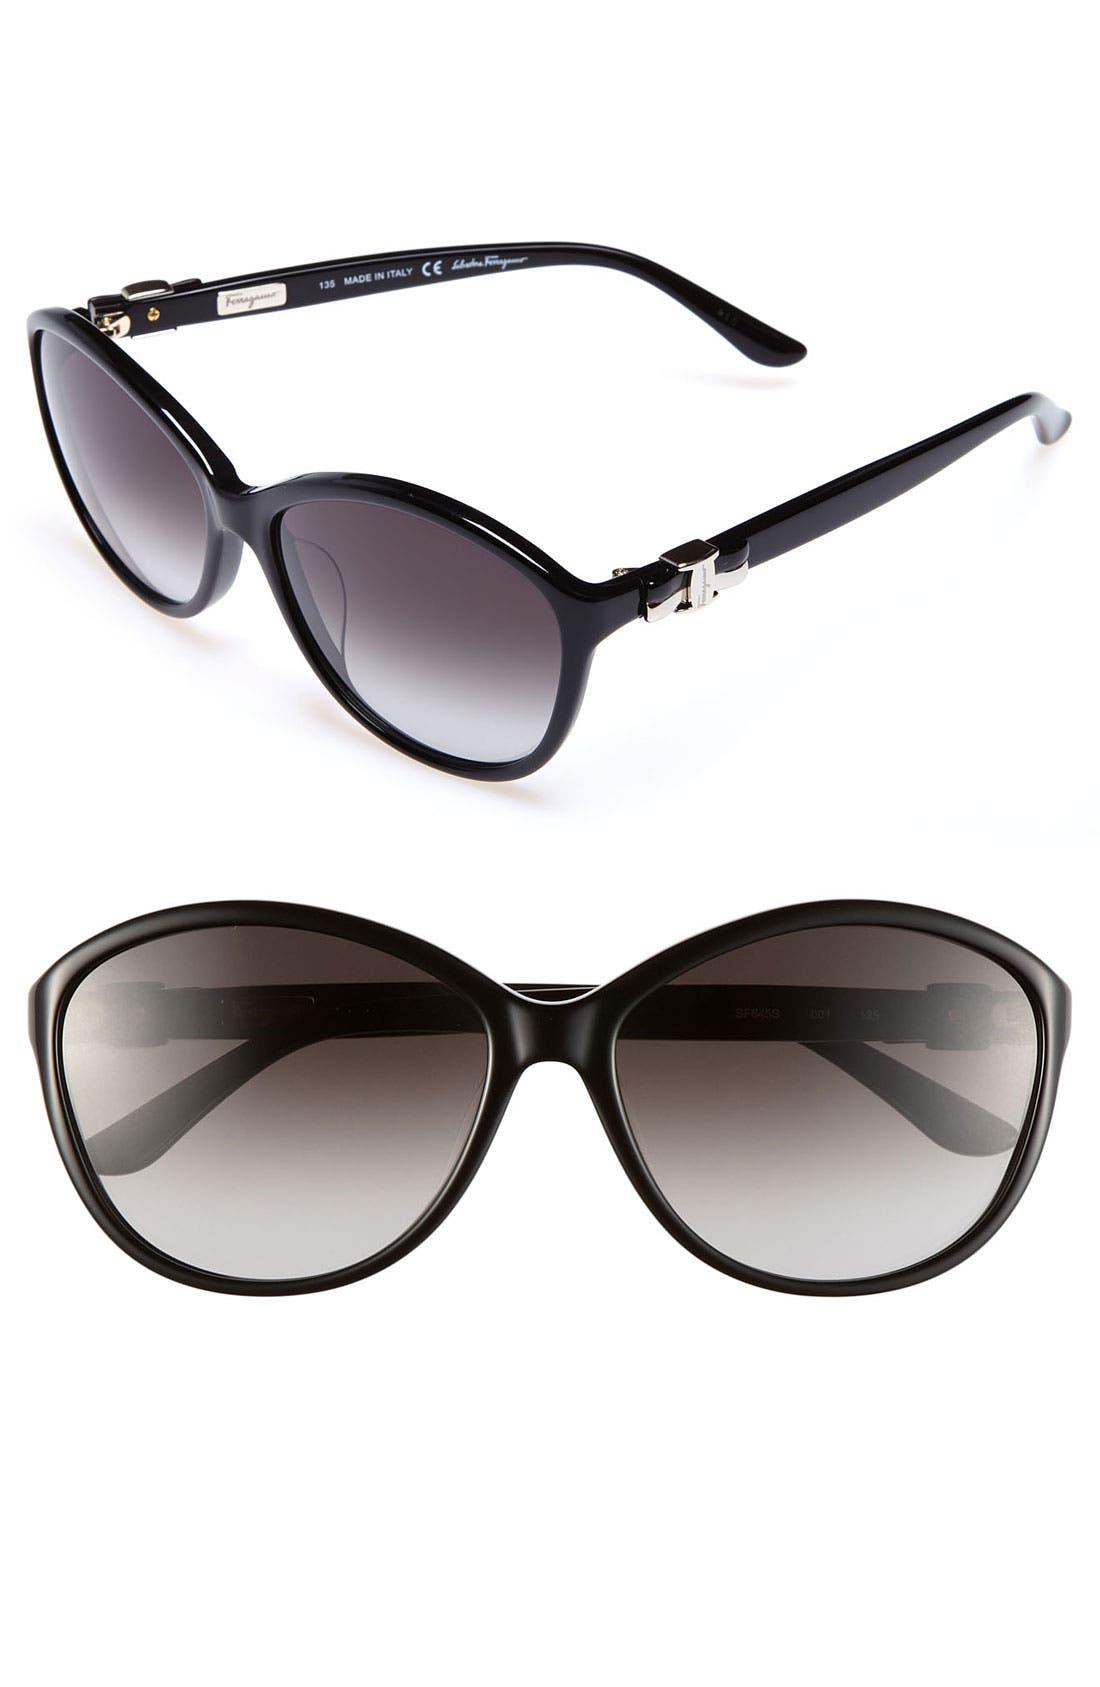 Alternate Image 1 Selected - Salvatore Ferragamo 58mm Oversized Sunglasses